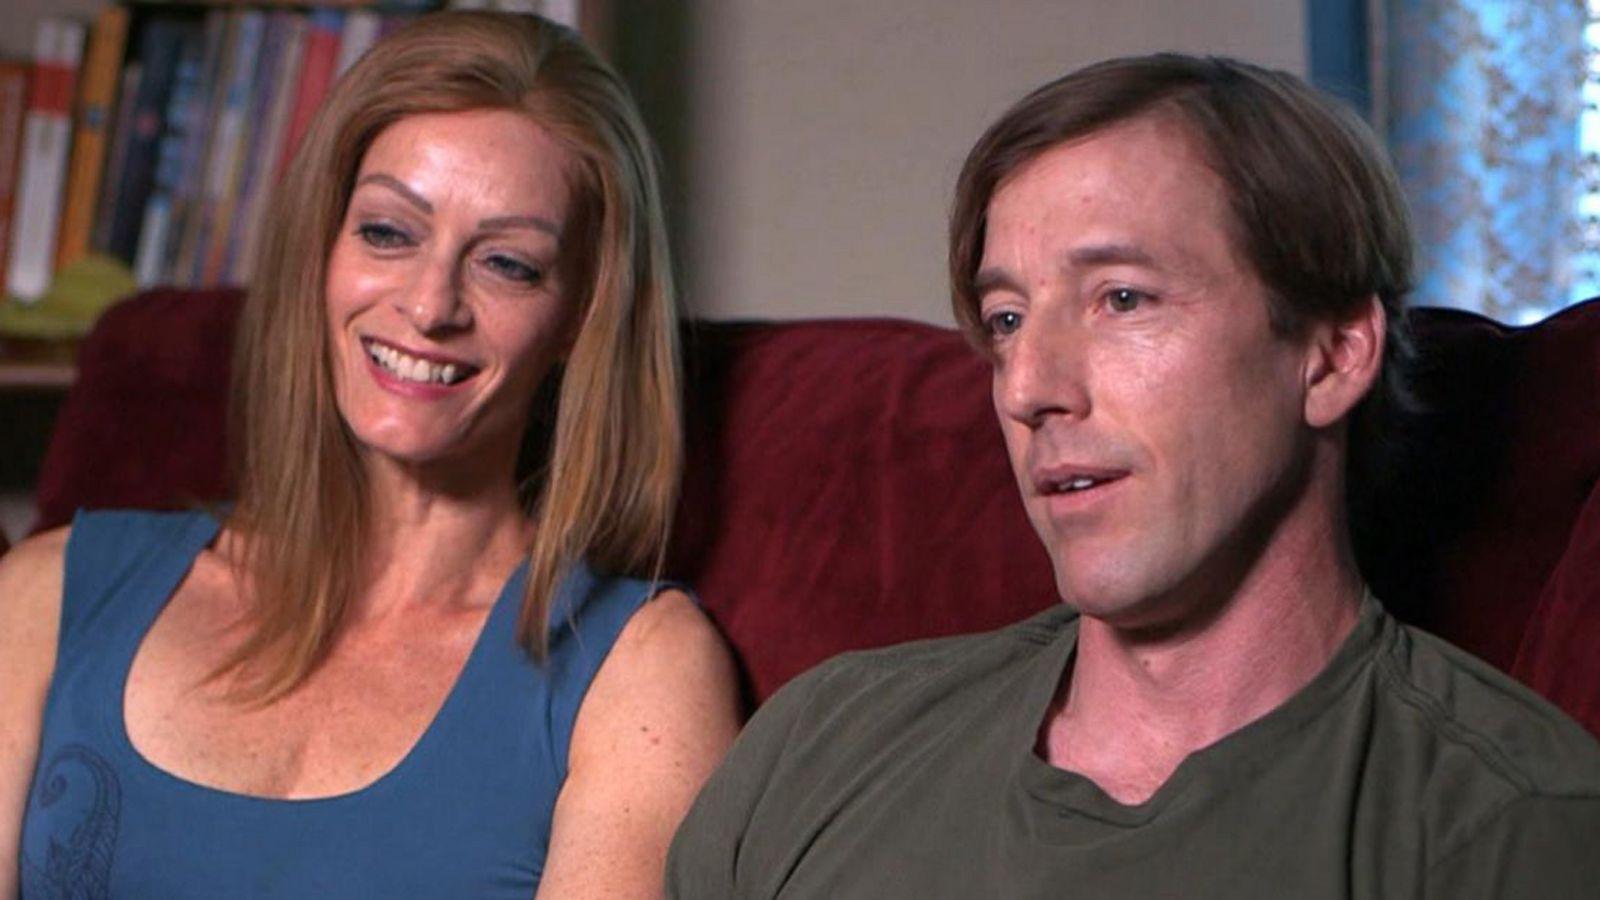 'Cam couples' share their own interactive porn via webcam for money Video -  ABC News